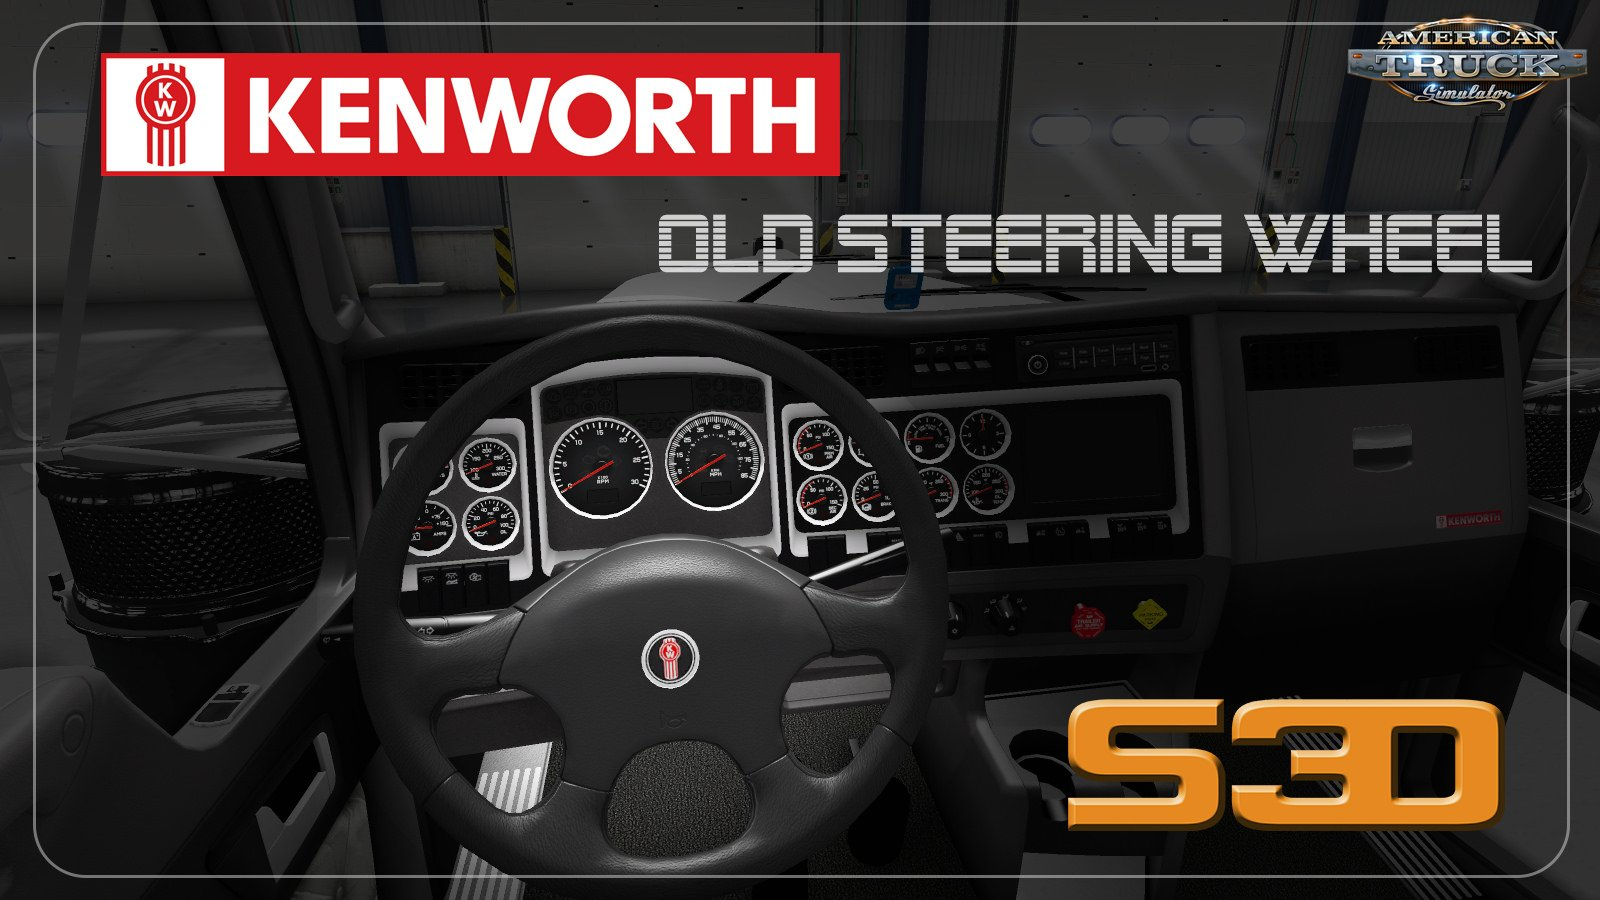 Old Kenworth Steering Wheel model for Ats